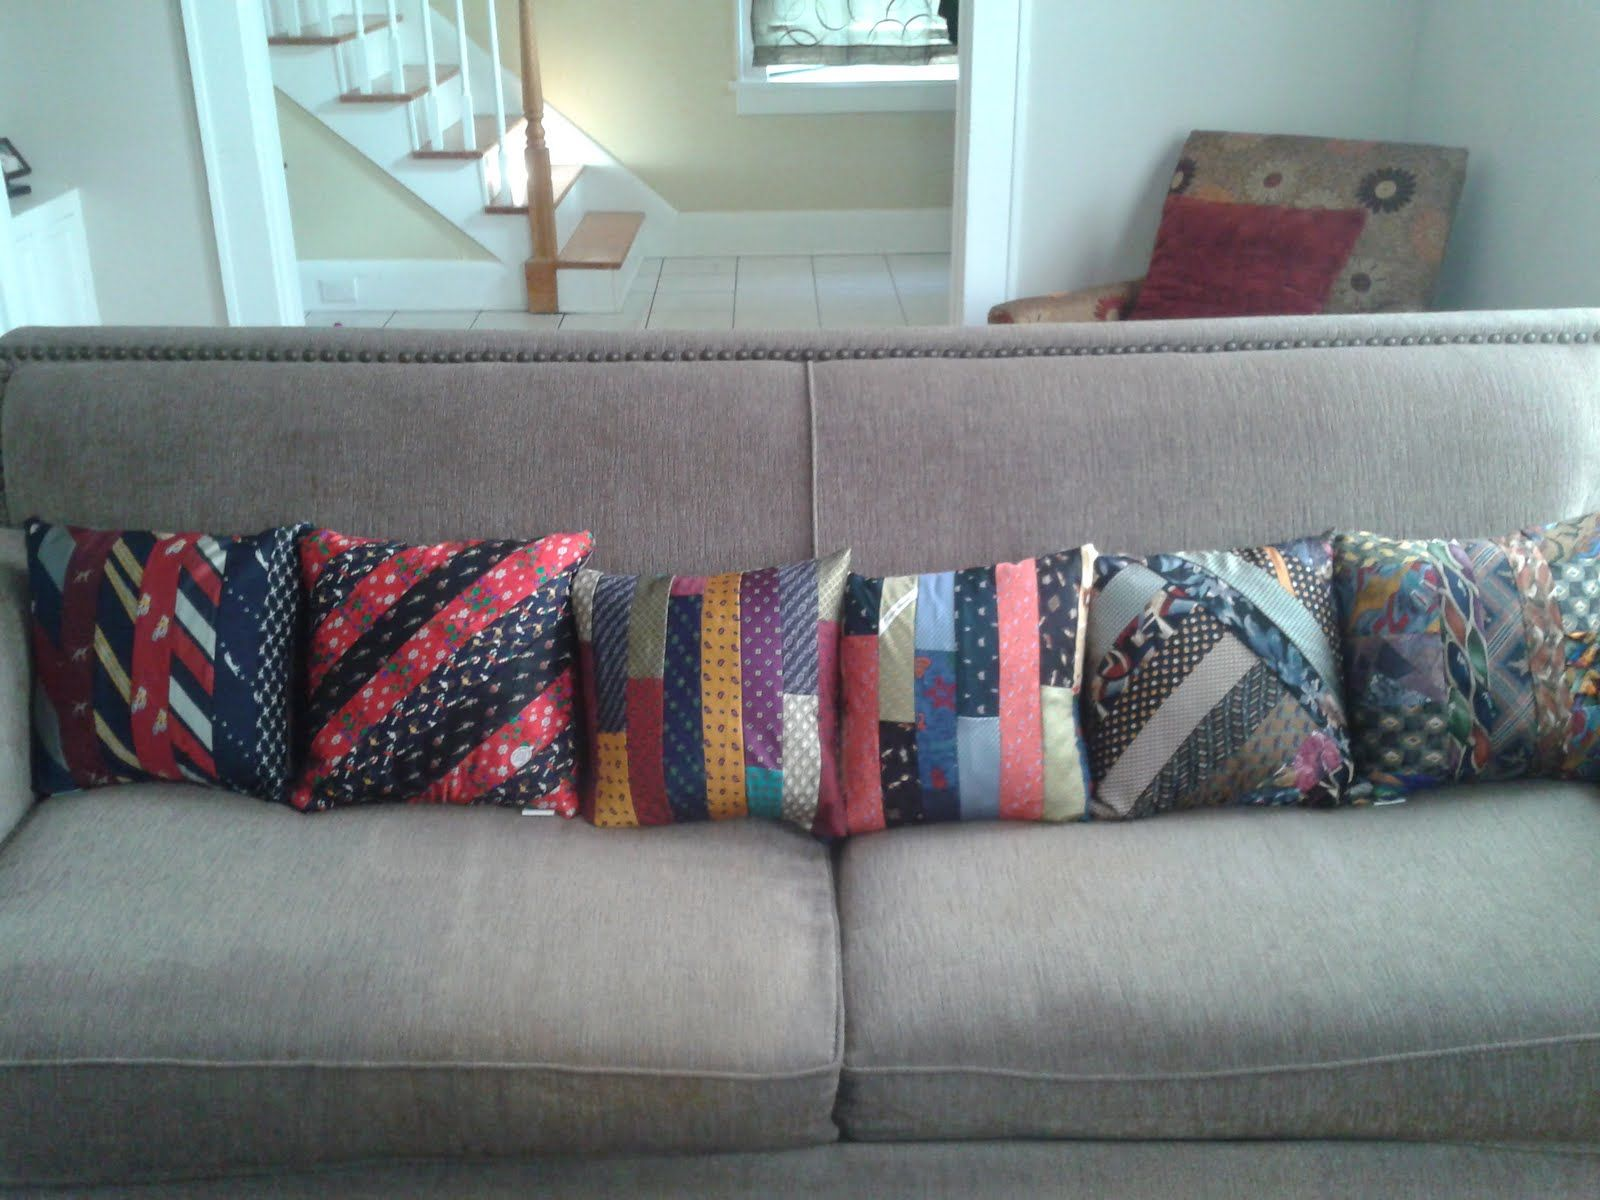 upcycling krawatten neue ideen pinterest krawatten upcycling und neue ideen. Black Bedroom Furniture Sets. Home Design Ideas